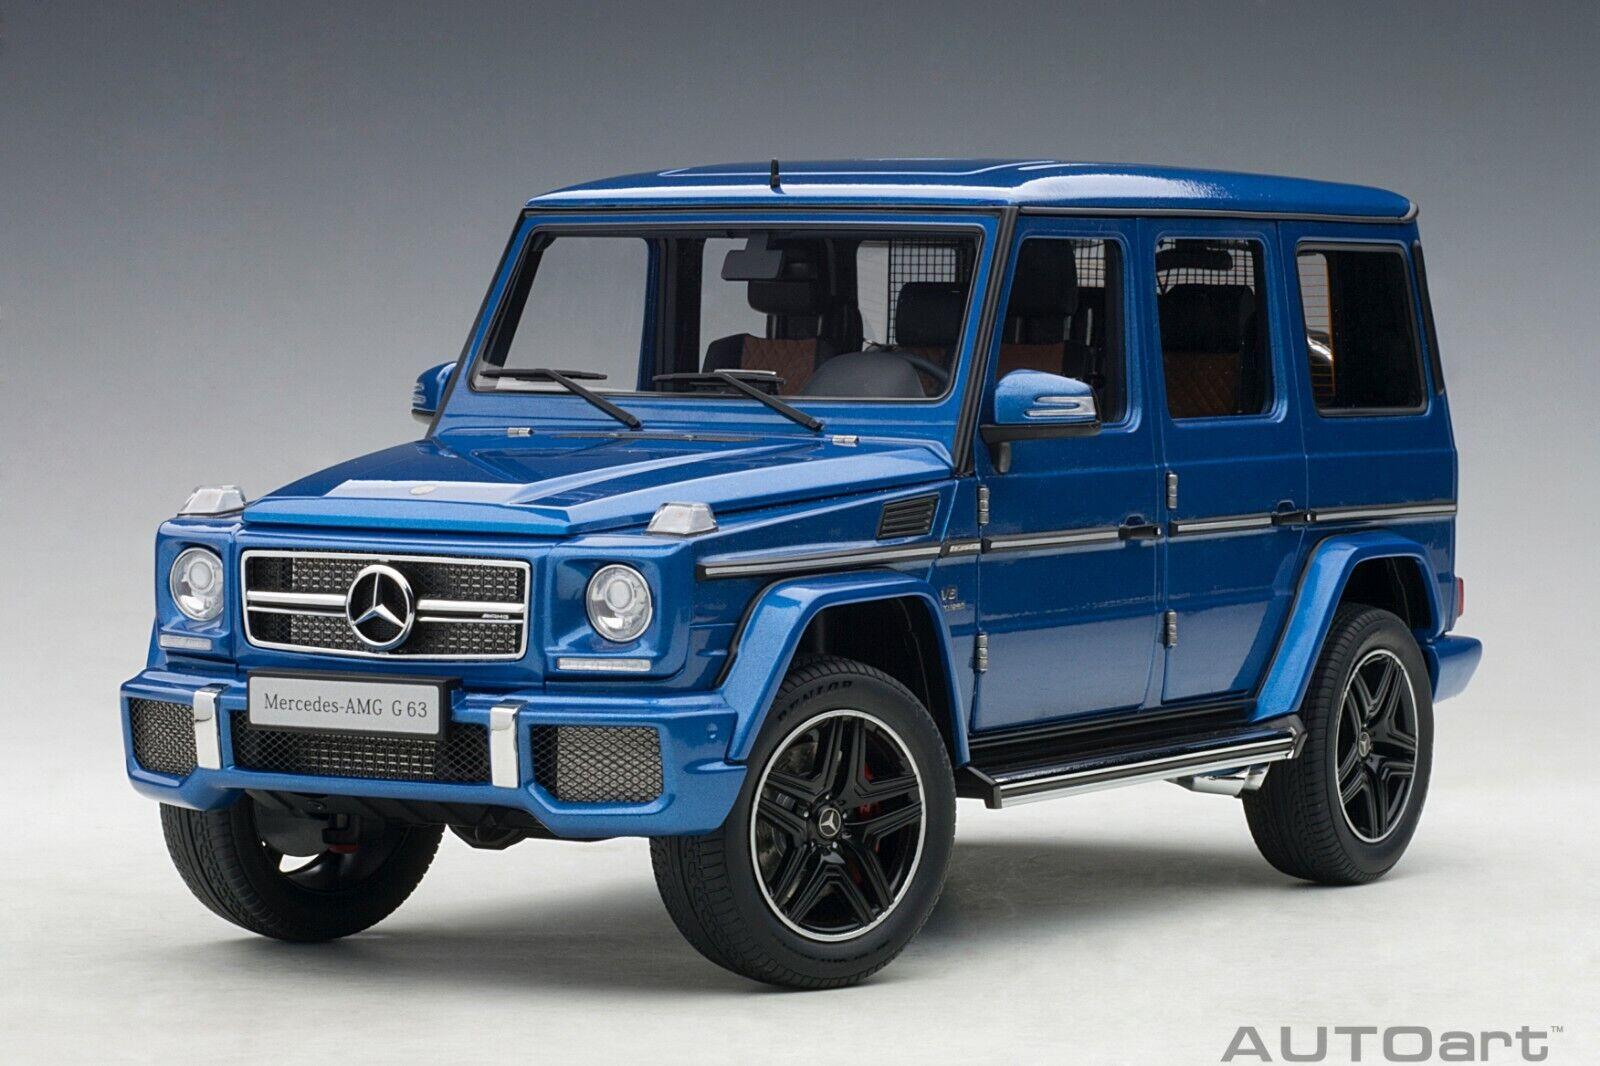 Mercedes-Benz G63 AMG 50TH ANNIVERSAIRE Designo Maurice bleu 1 18 AUTOart 76324